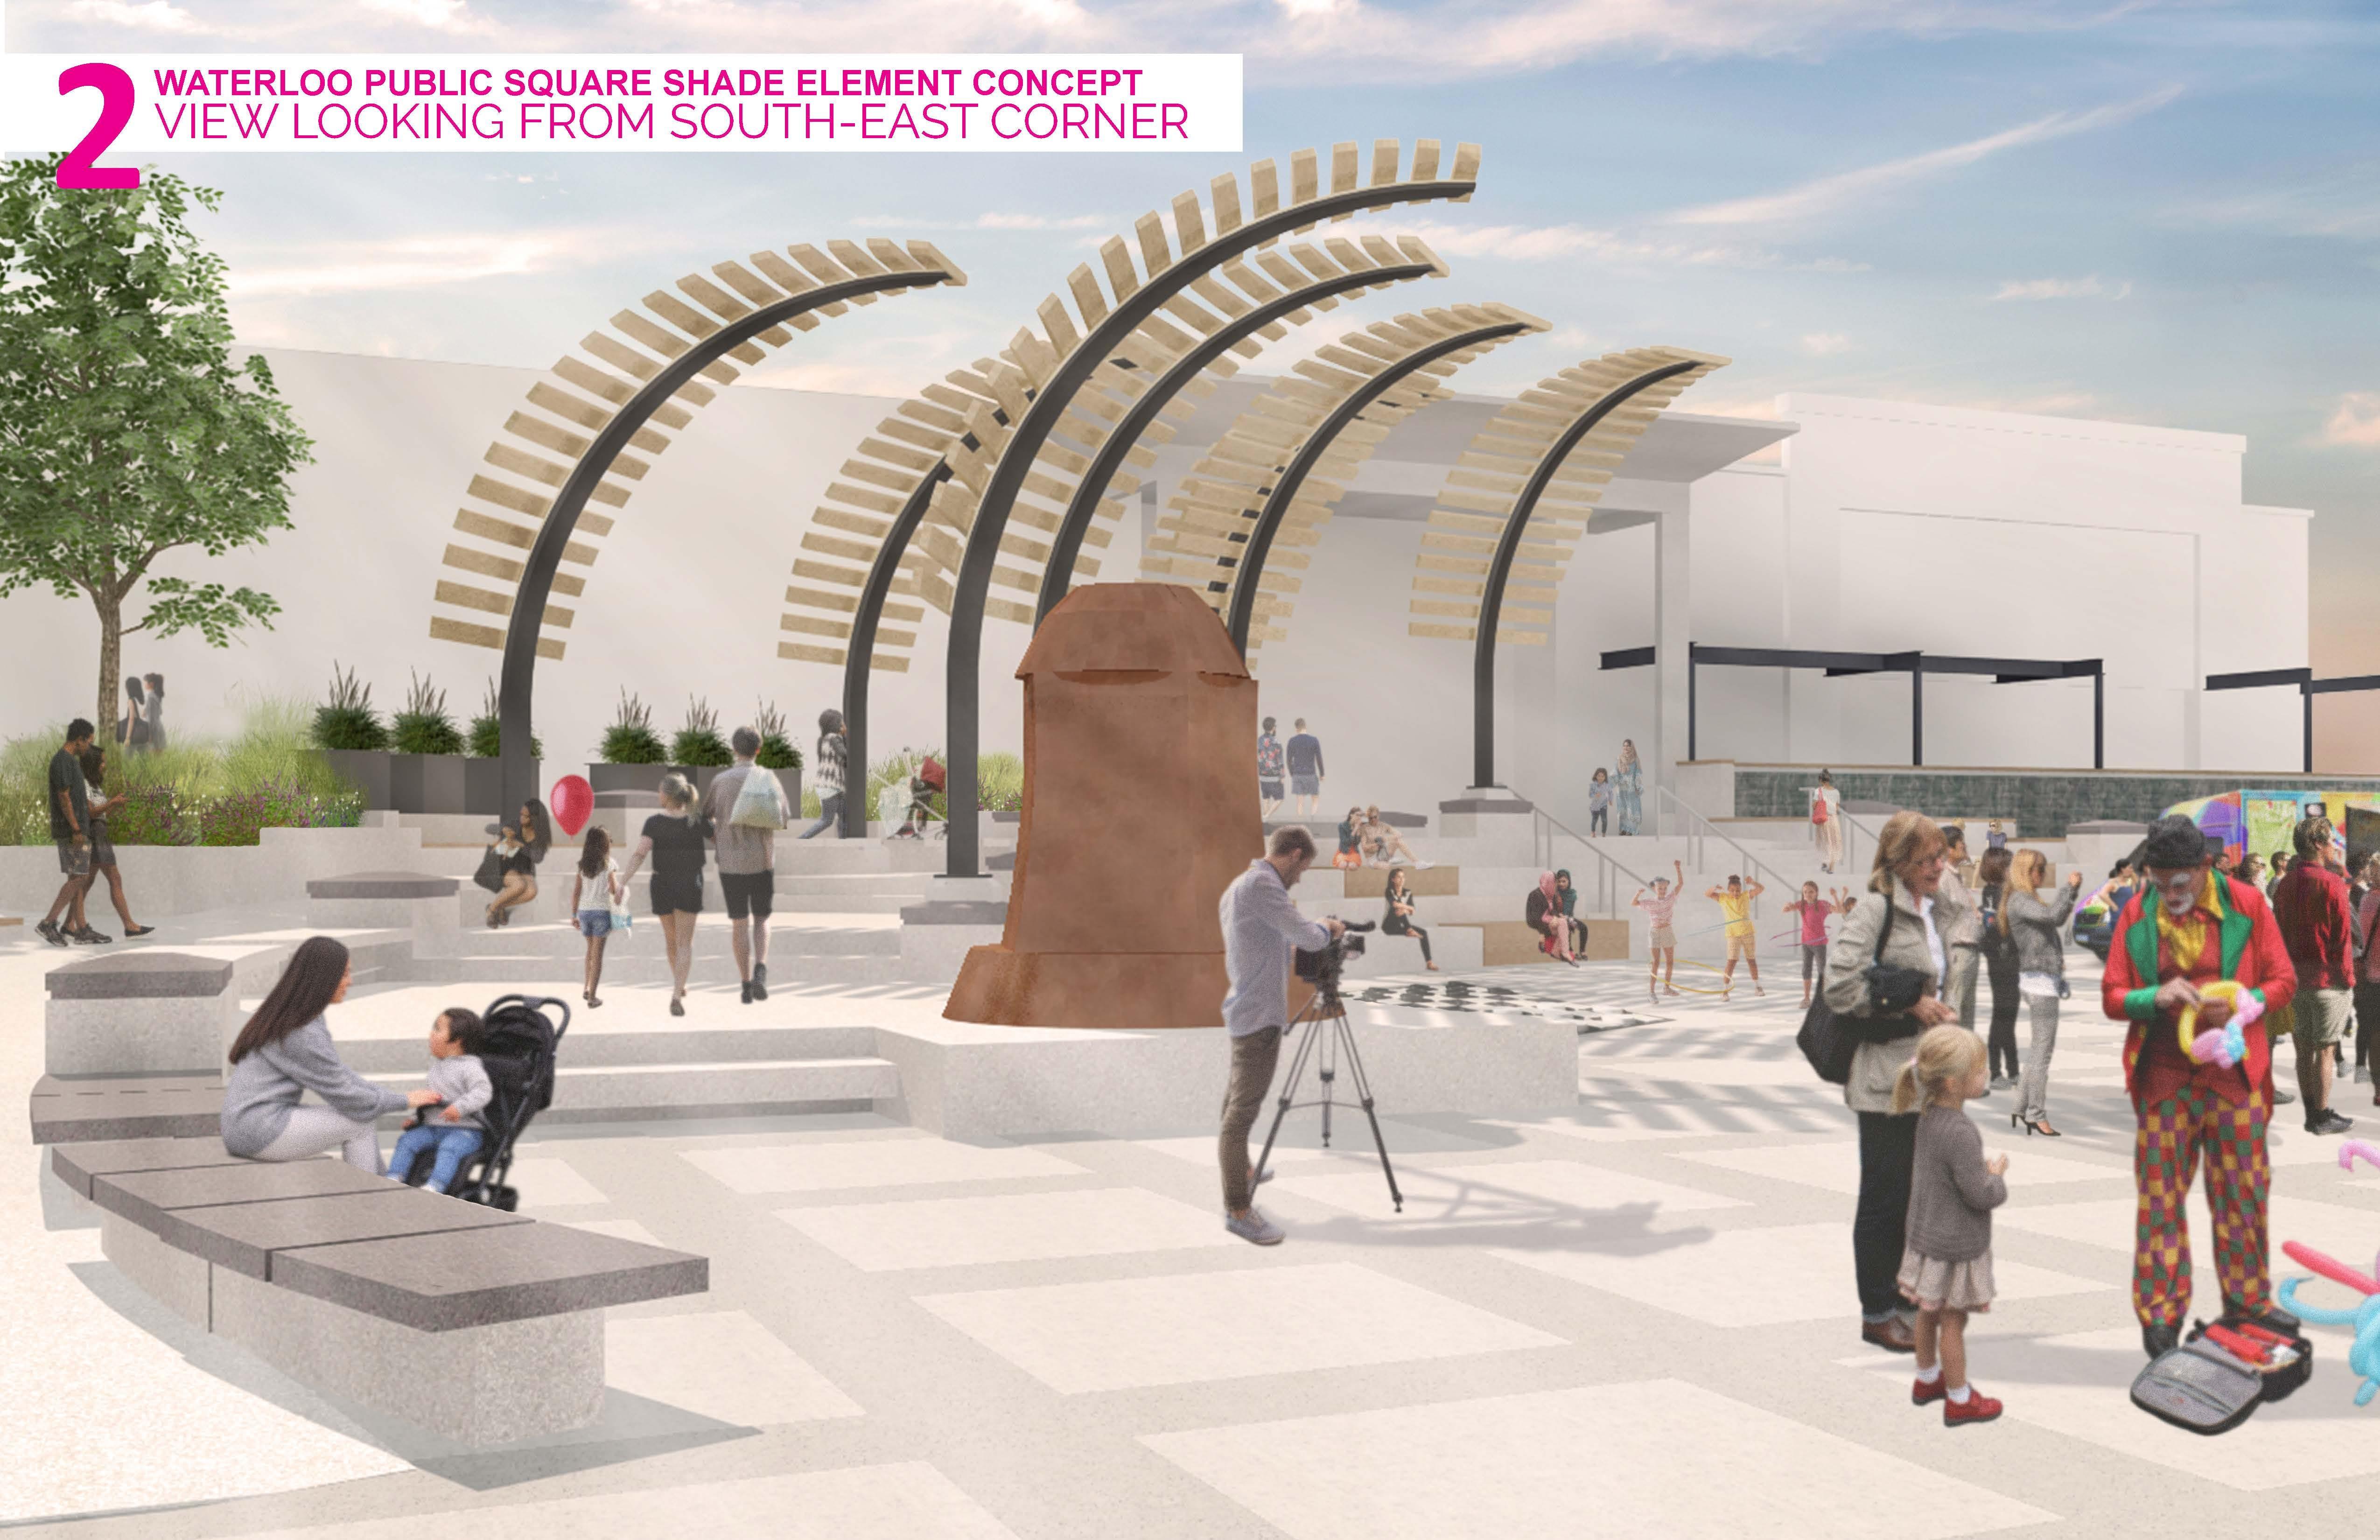 Public Square Shade Element Concept_View 2.jpg